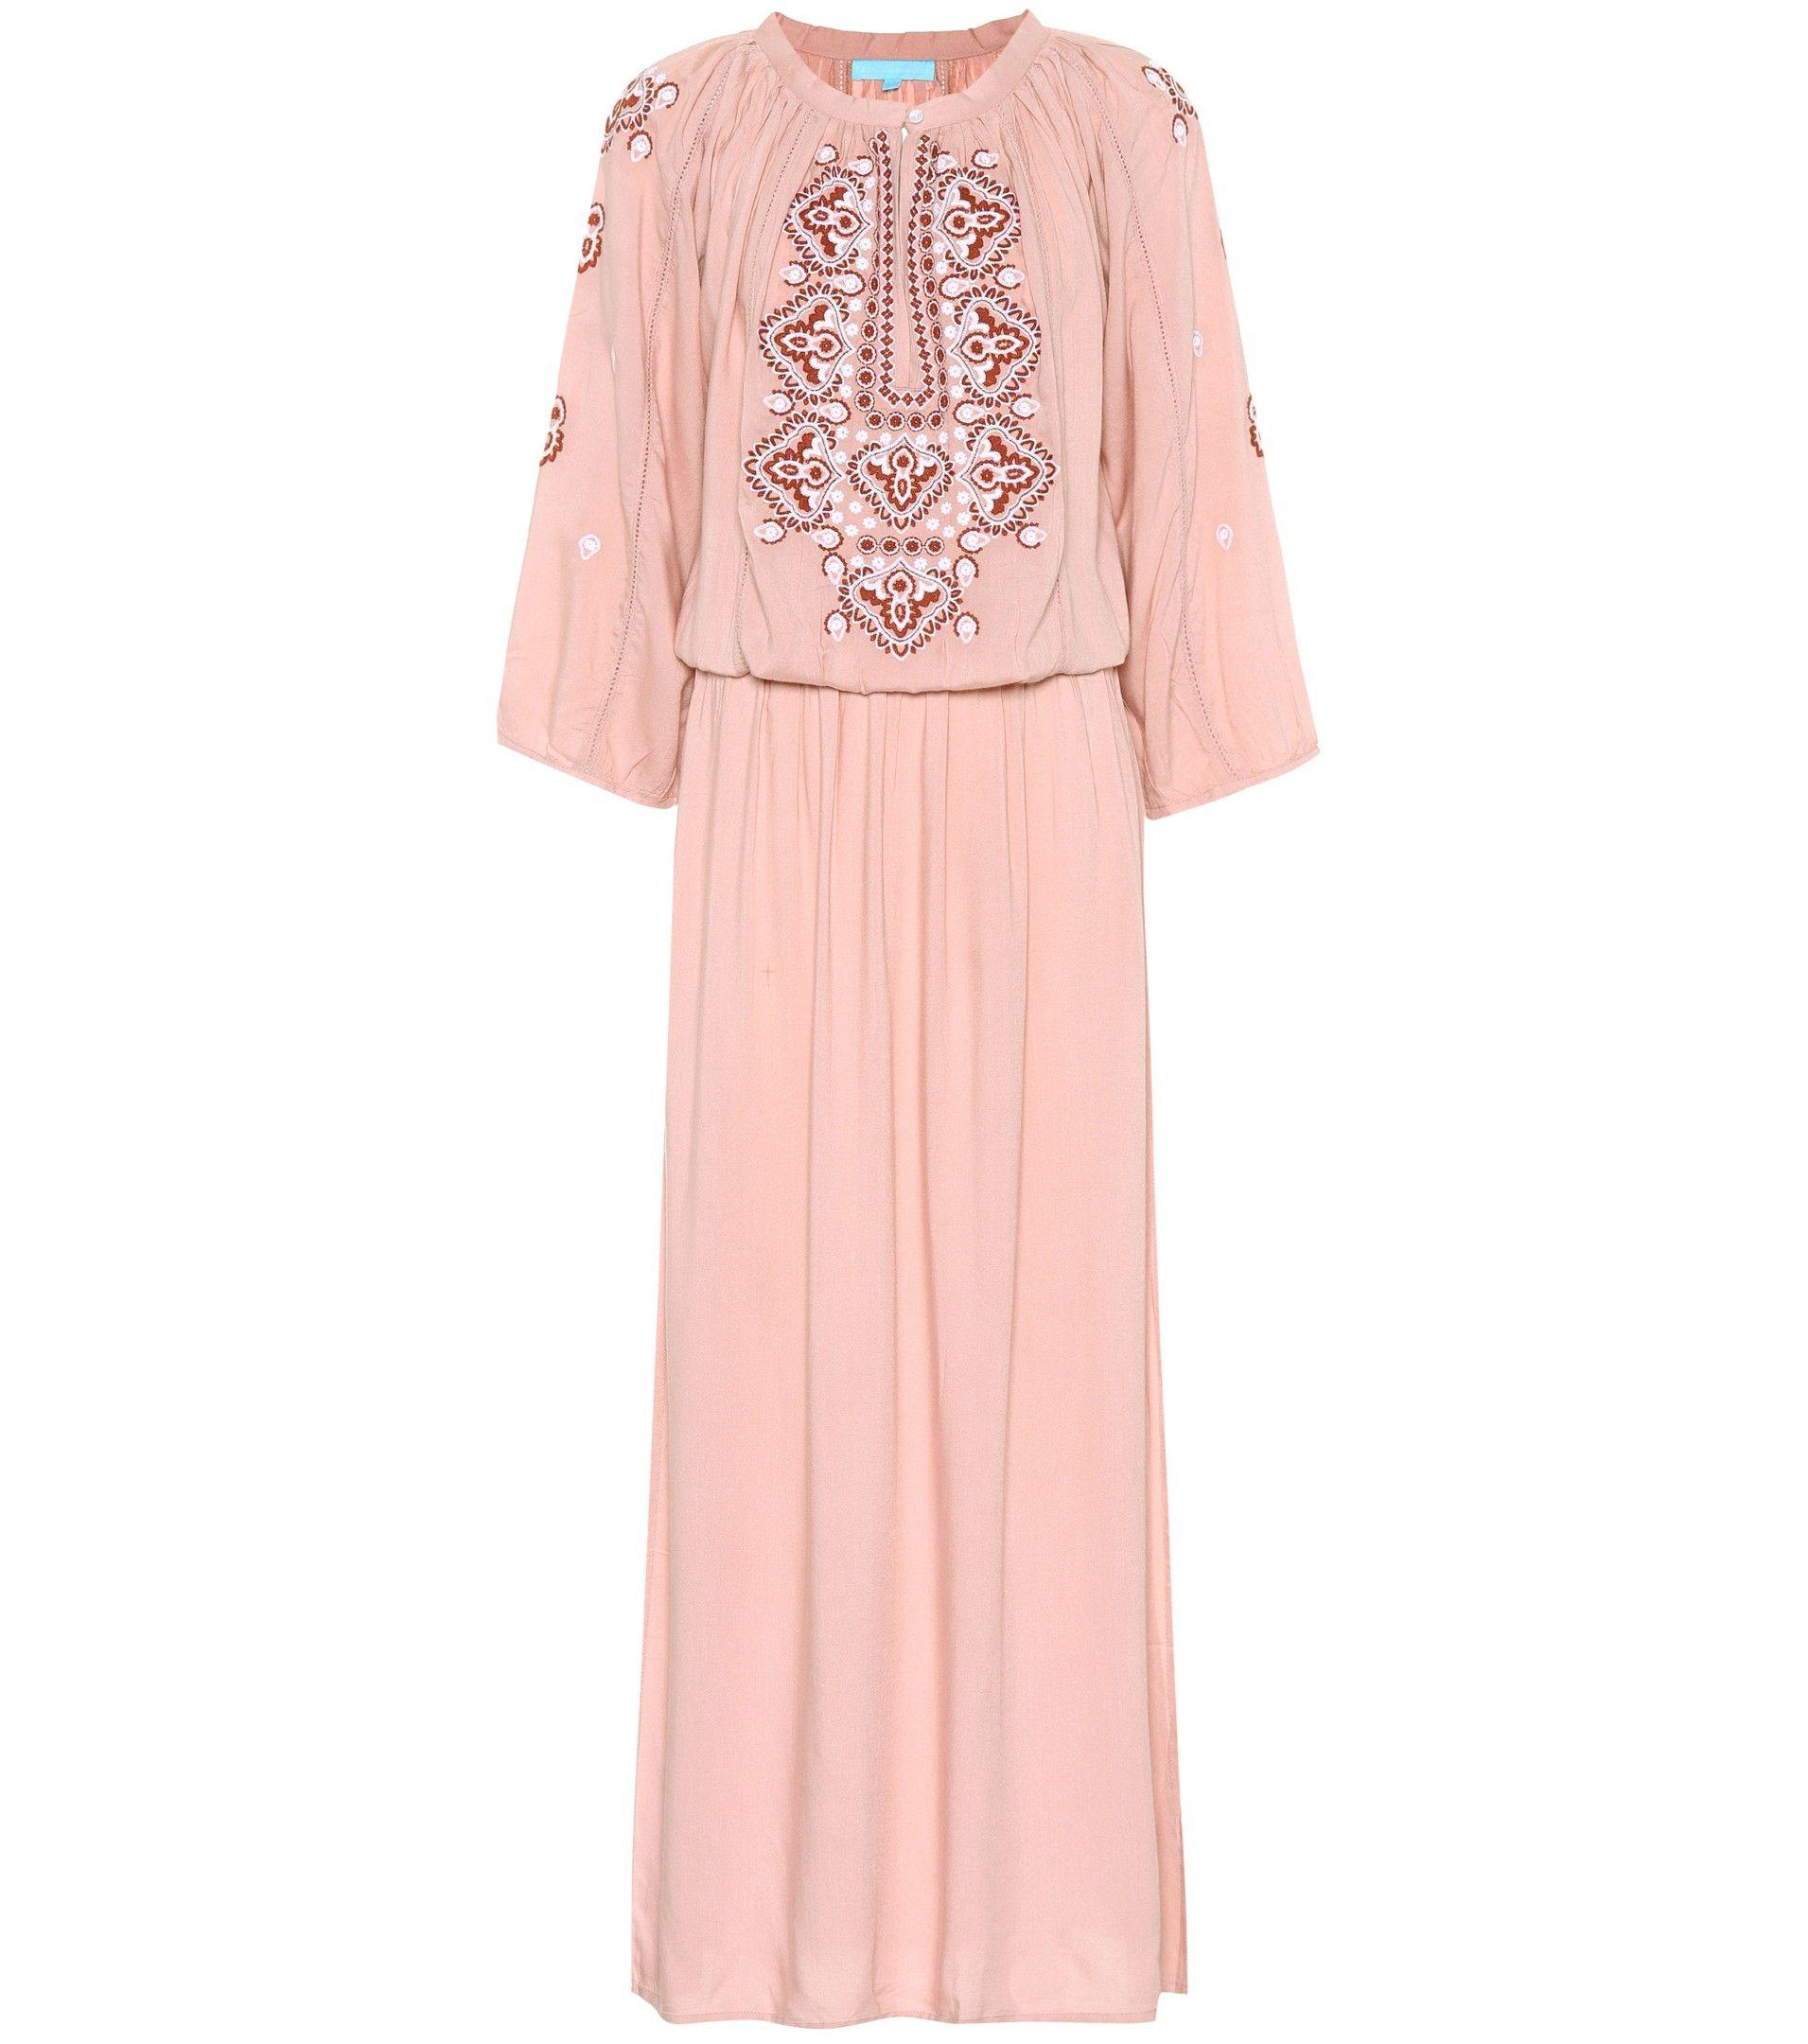 Melissa Odabash Woman Sienna Embroidered Voile Maxi Dress White Size S Melissa Odabash U2aYRNO0k